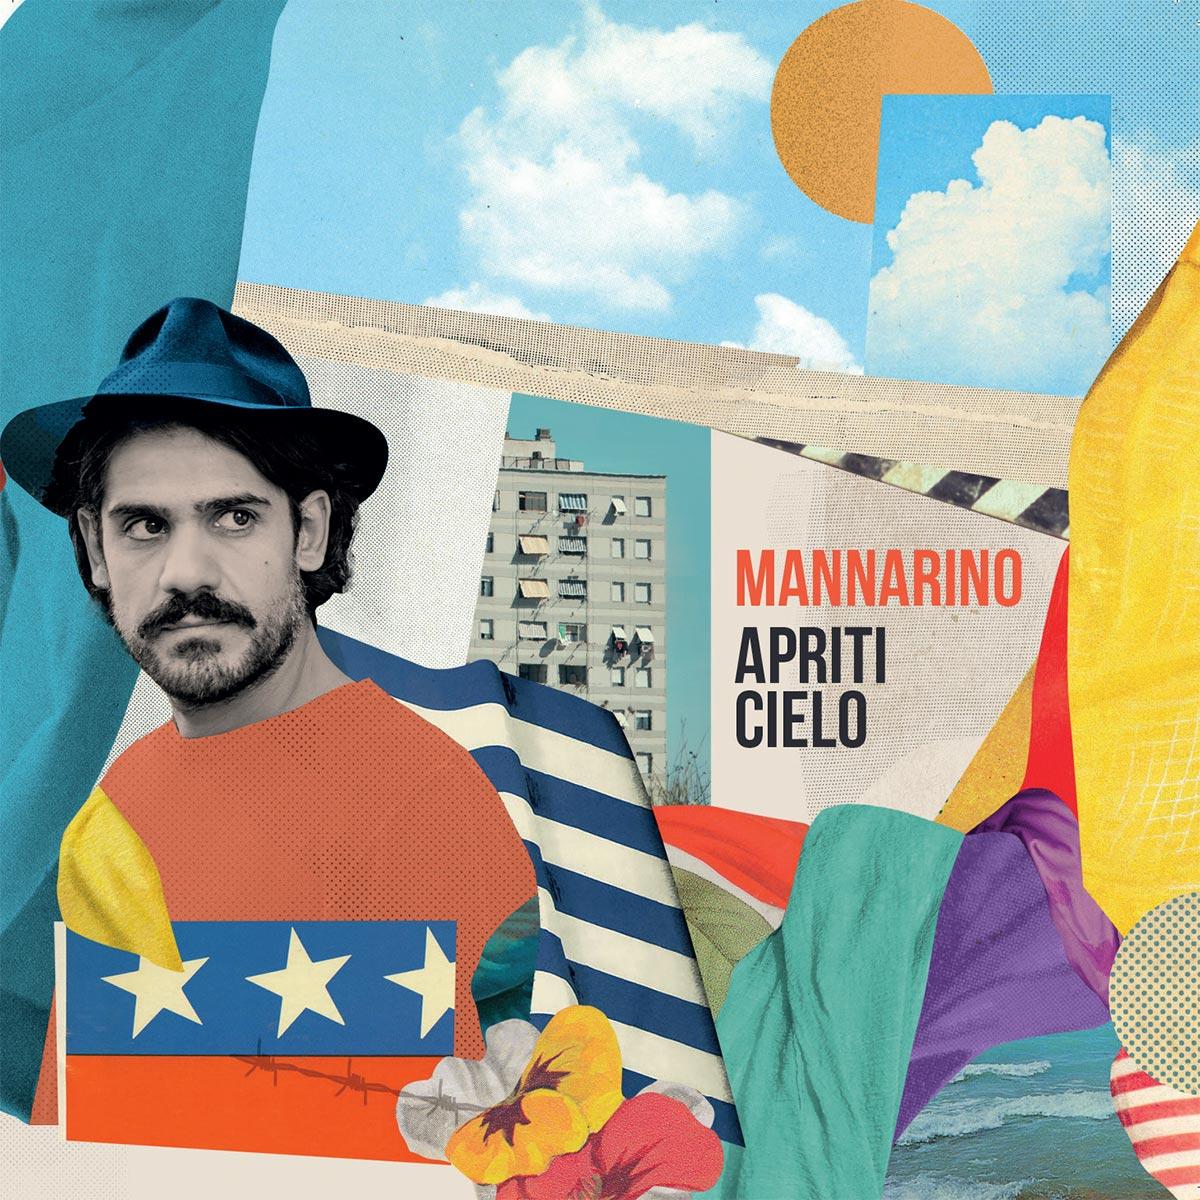 booklet_mannarino_apriti-cielo-1